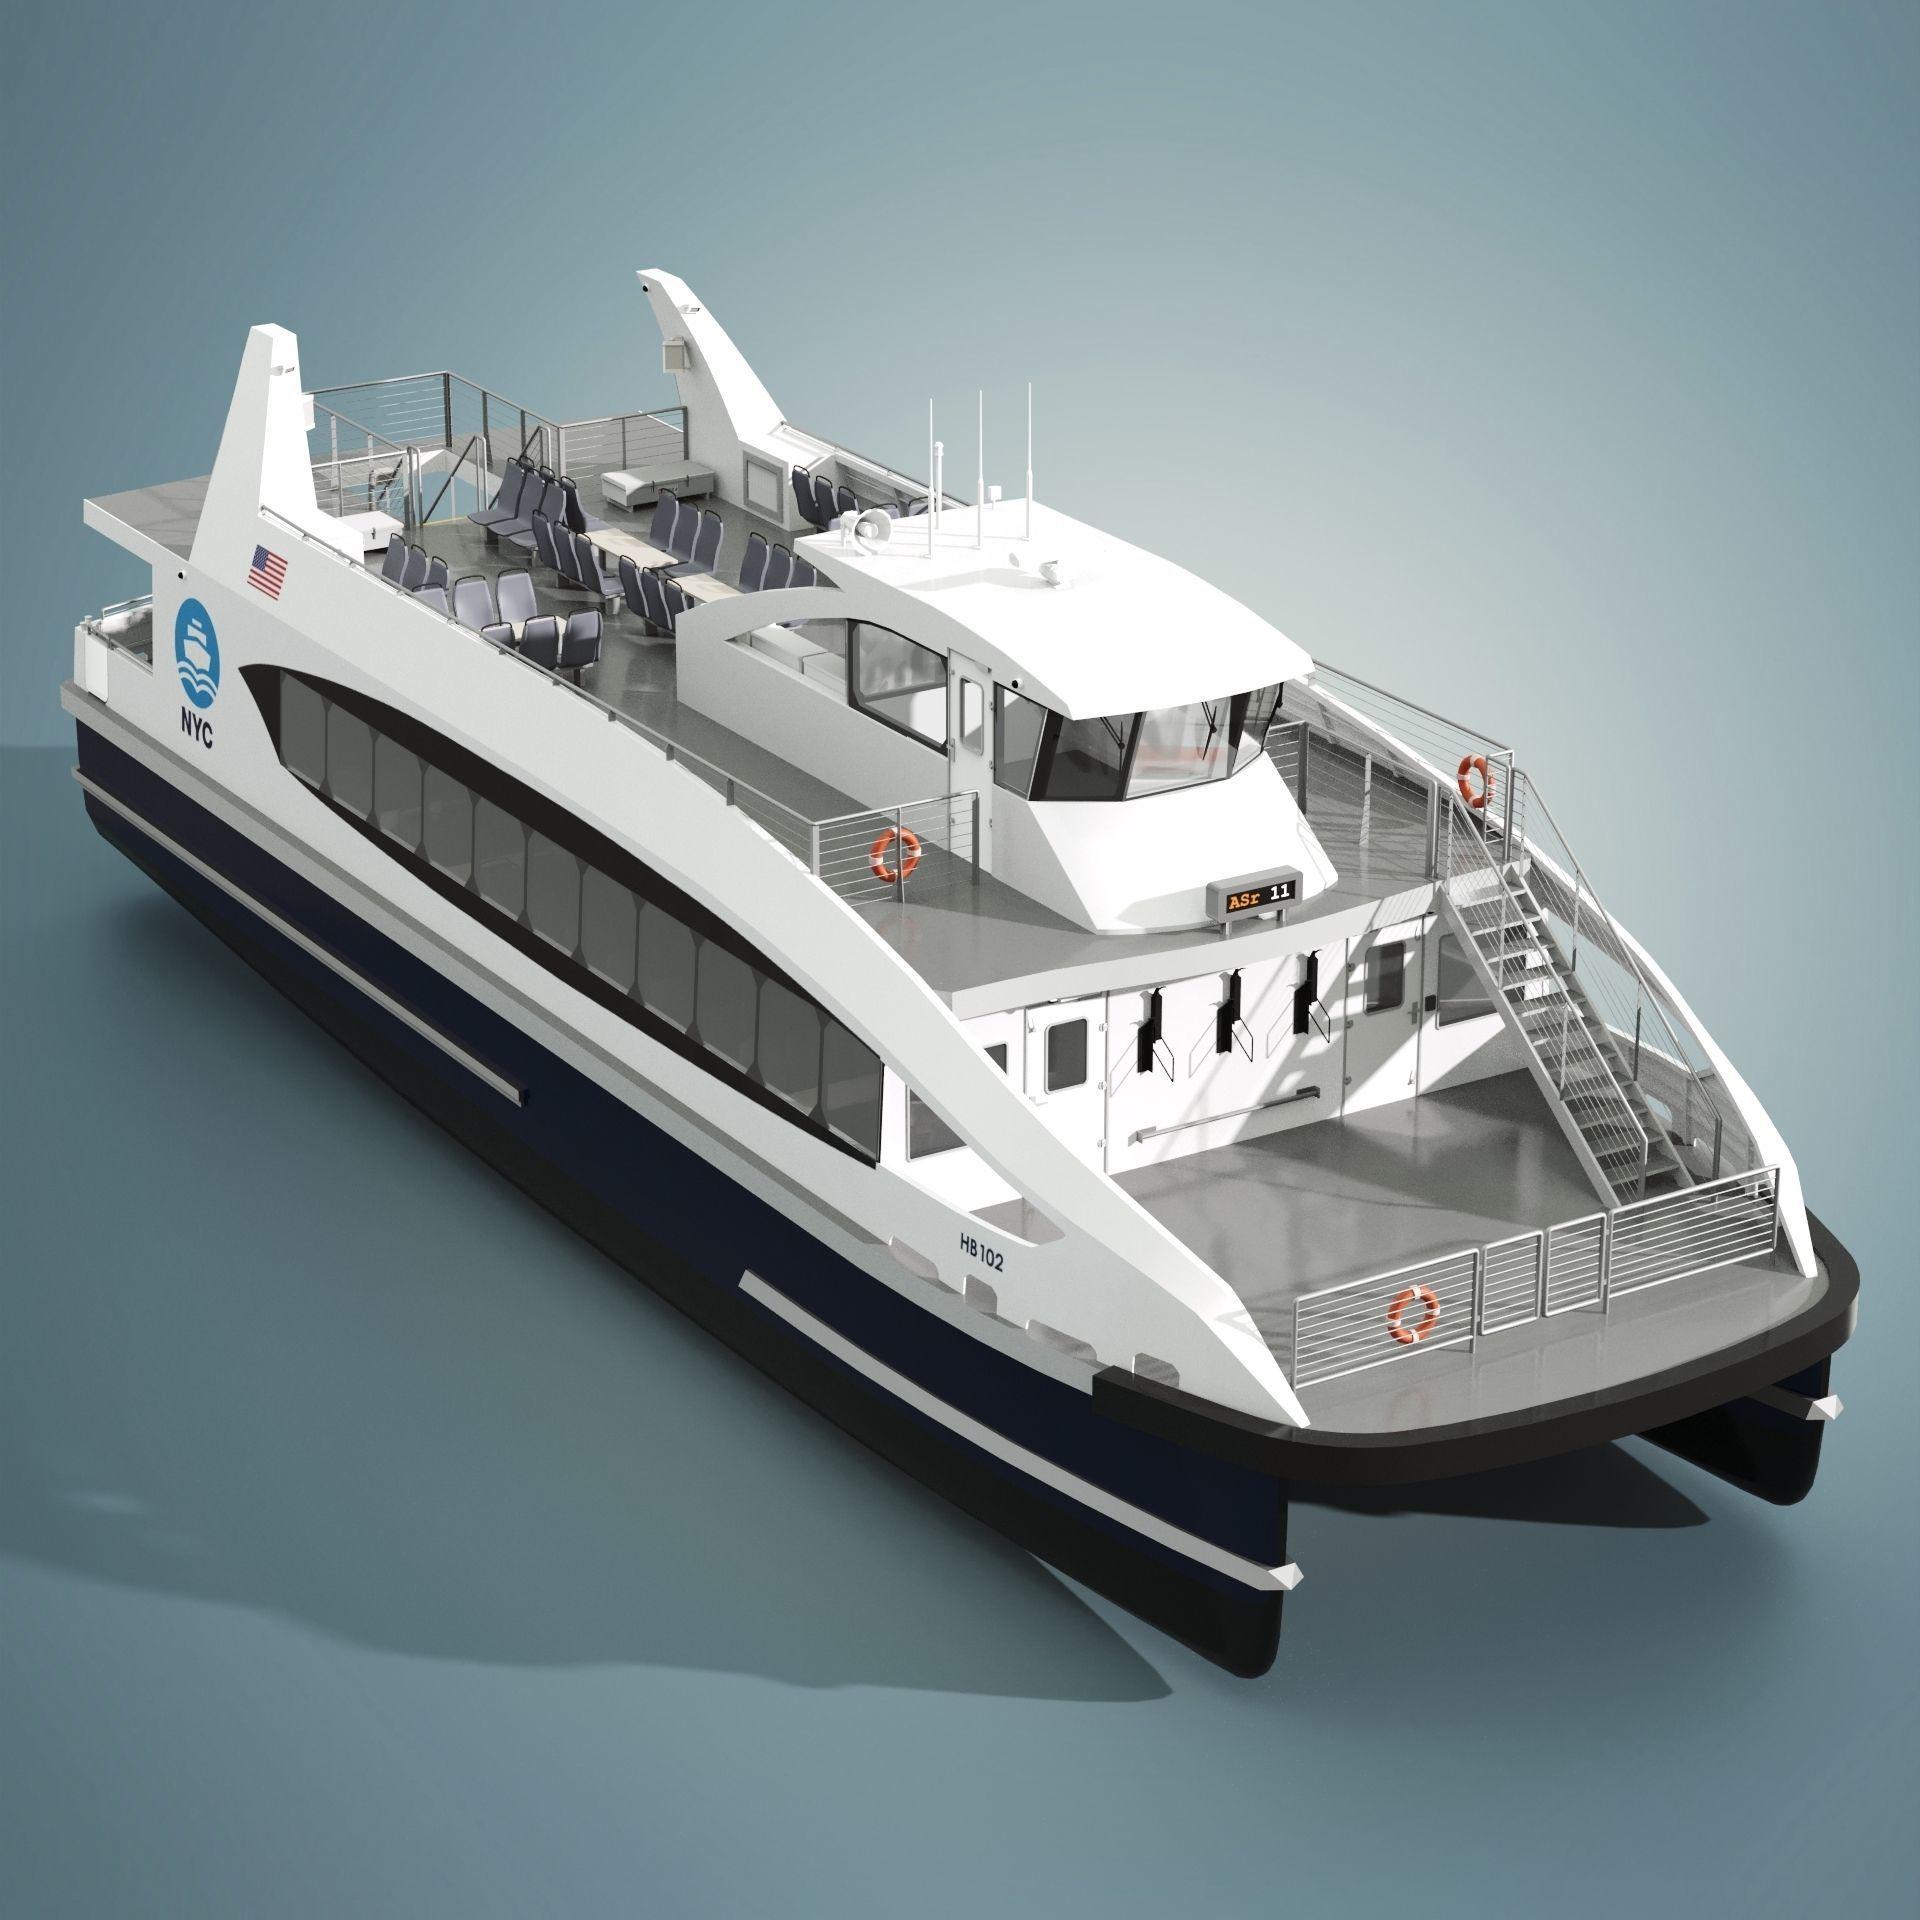 New York Ferry Boat